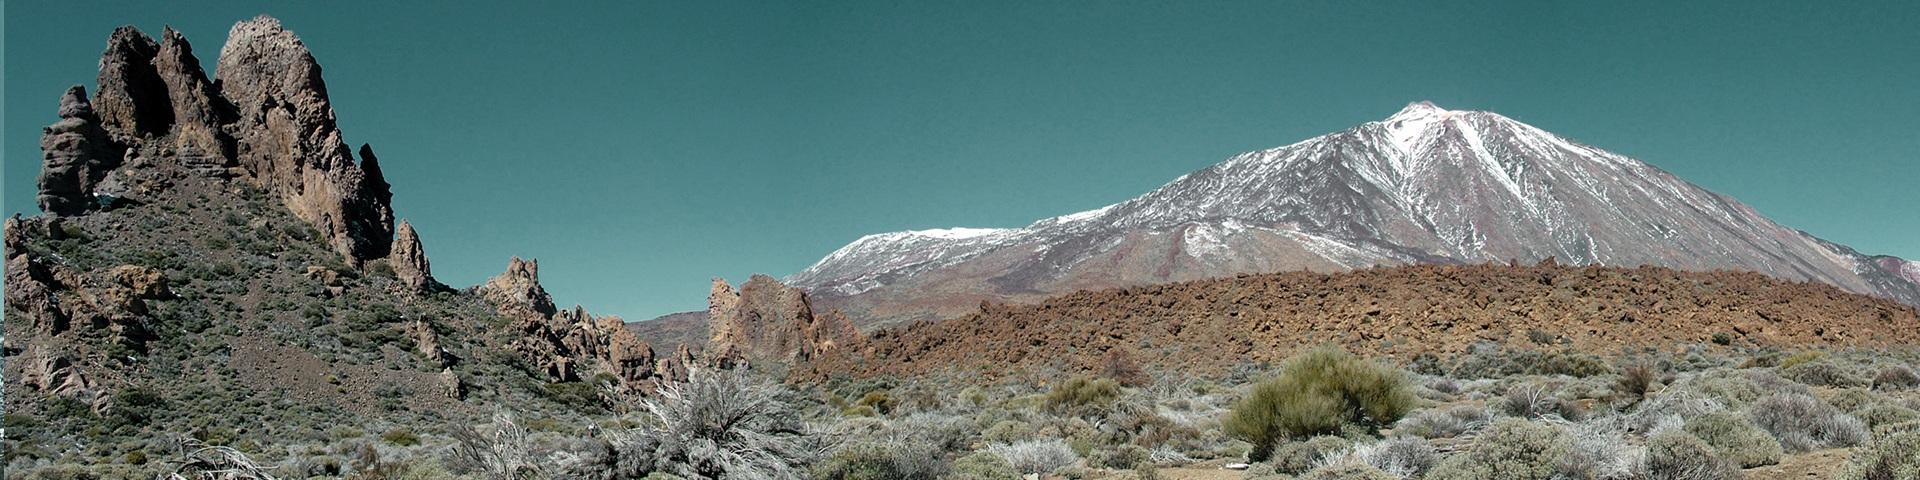 panoramic-943692.jpg